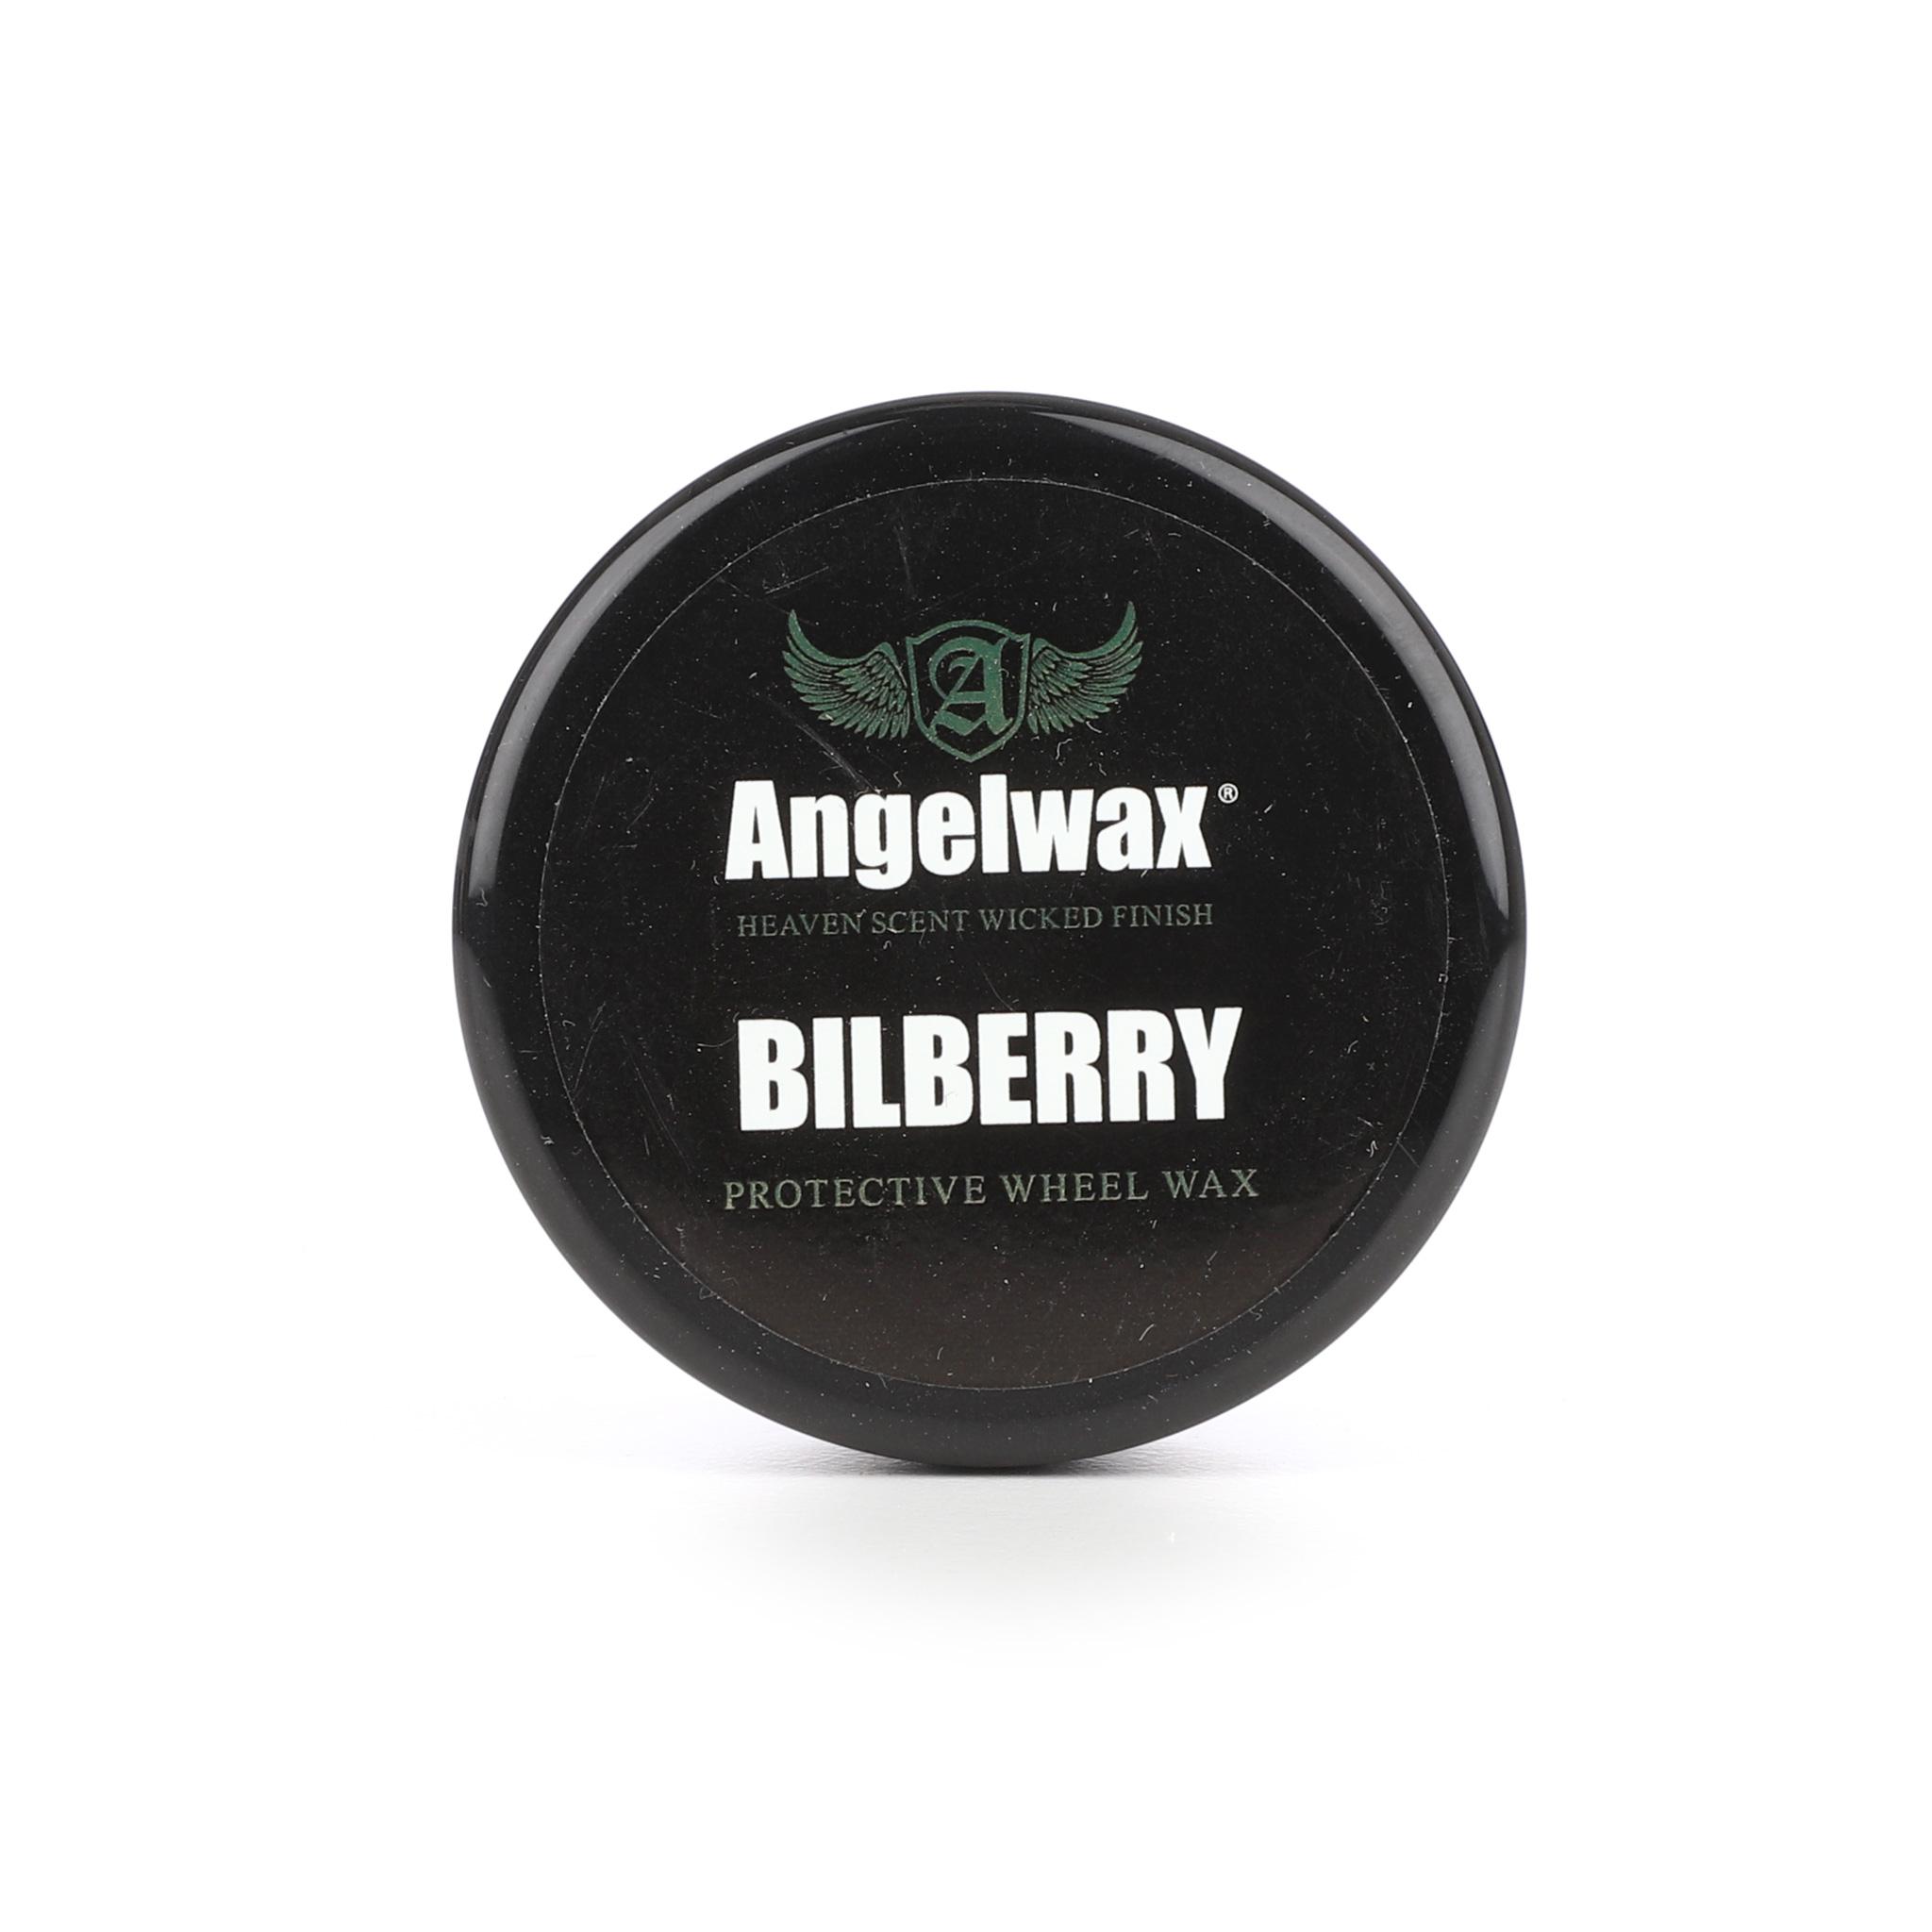 Fälgvax Angelwax Bilberry, 33 ml, Endast vax